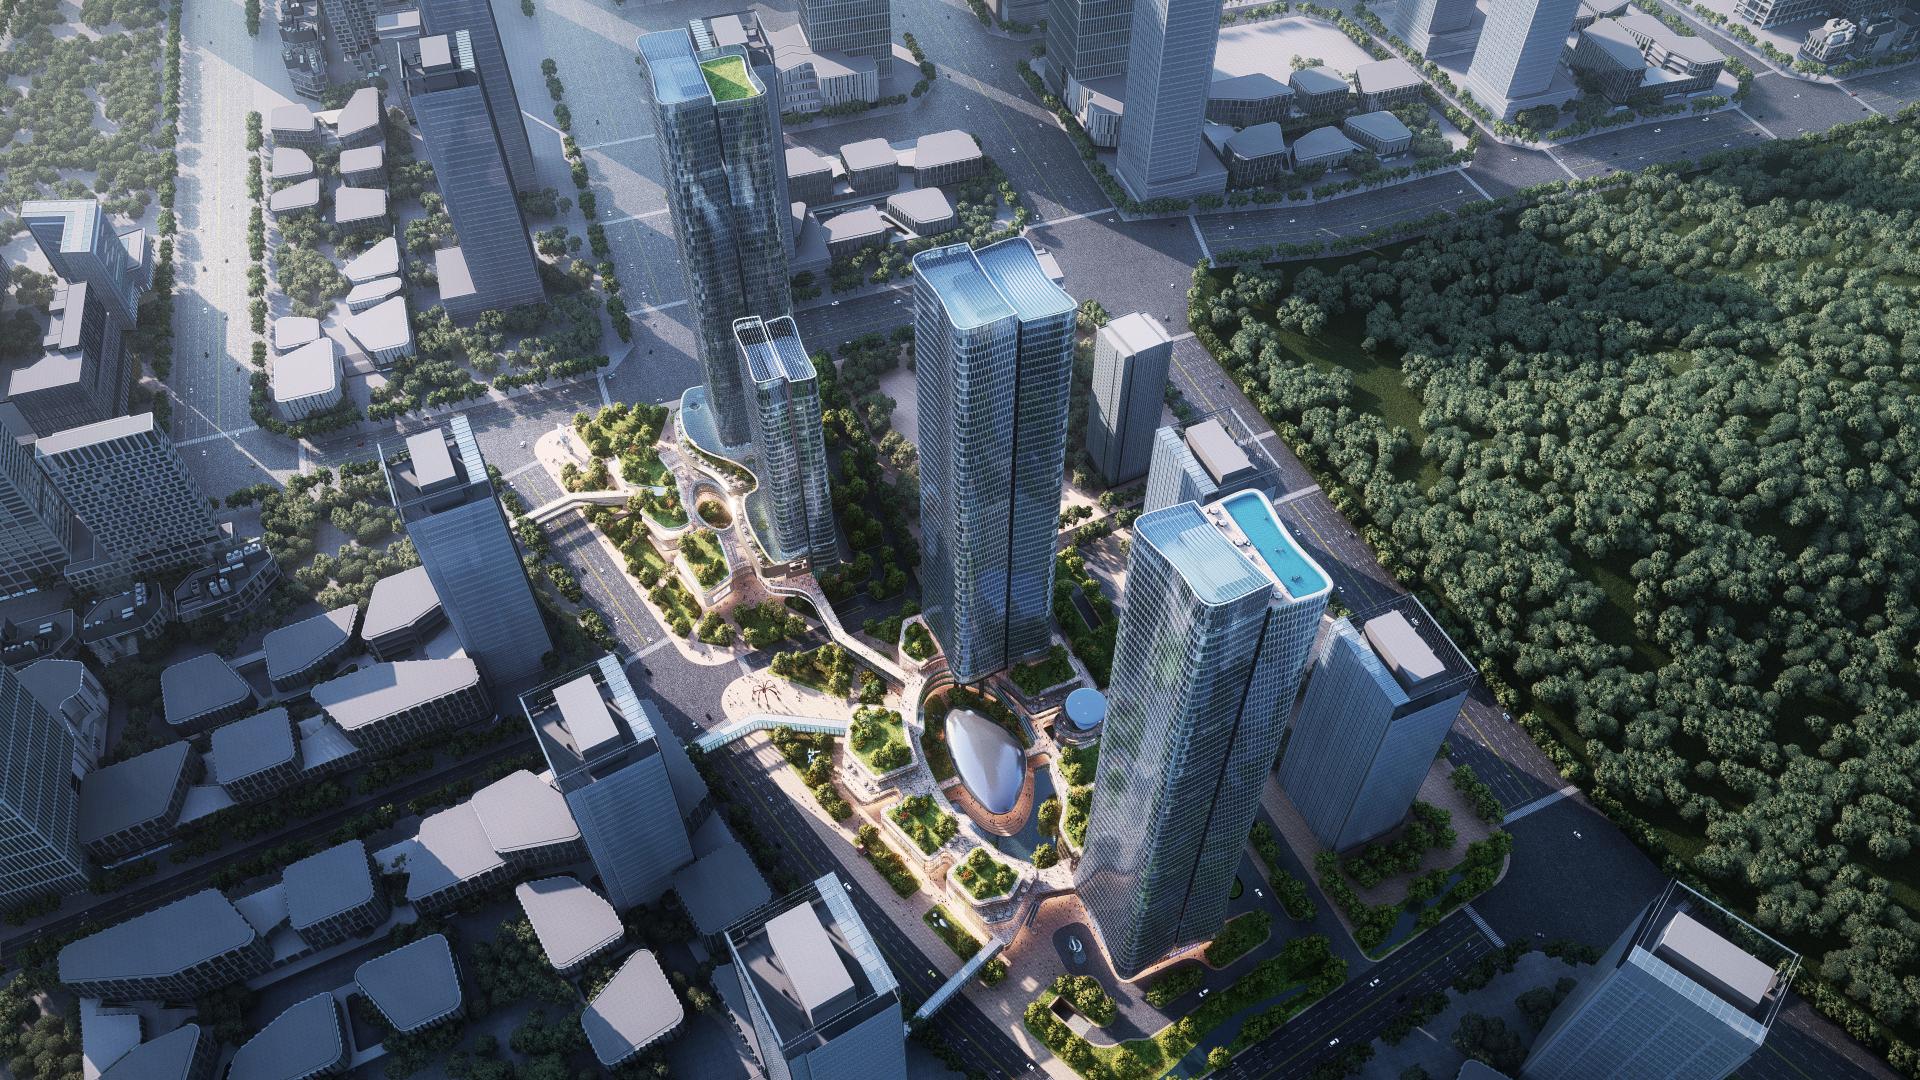 Zhuhai Hengqin International Business Center. Design and Project Architect: Aedas. Client: Zhuhai Da Heng Qin Company Limited.